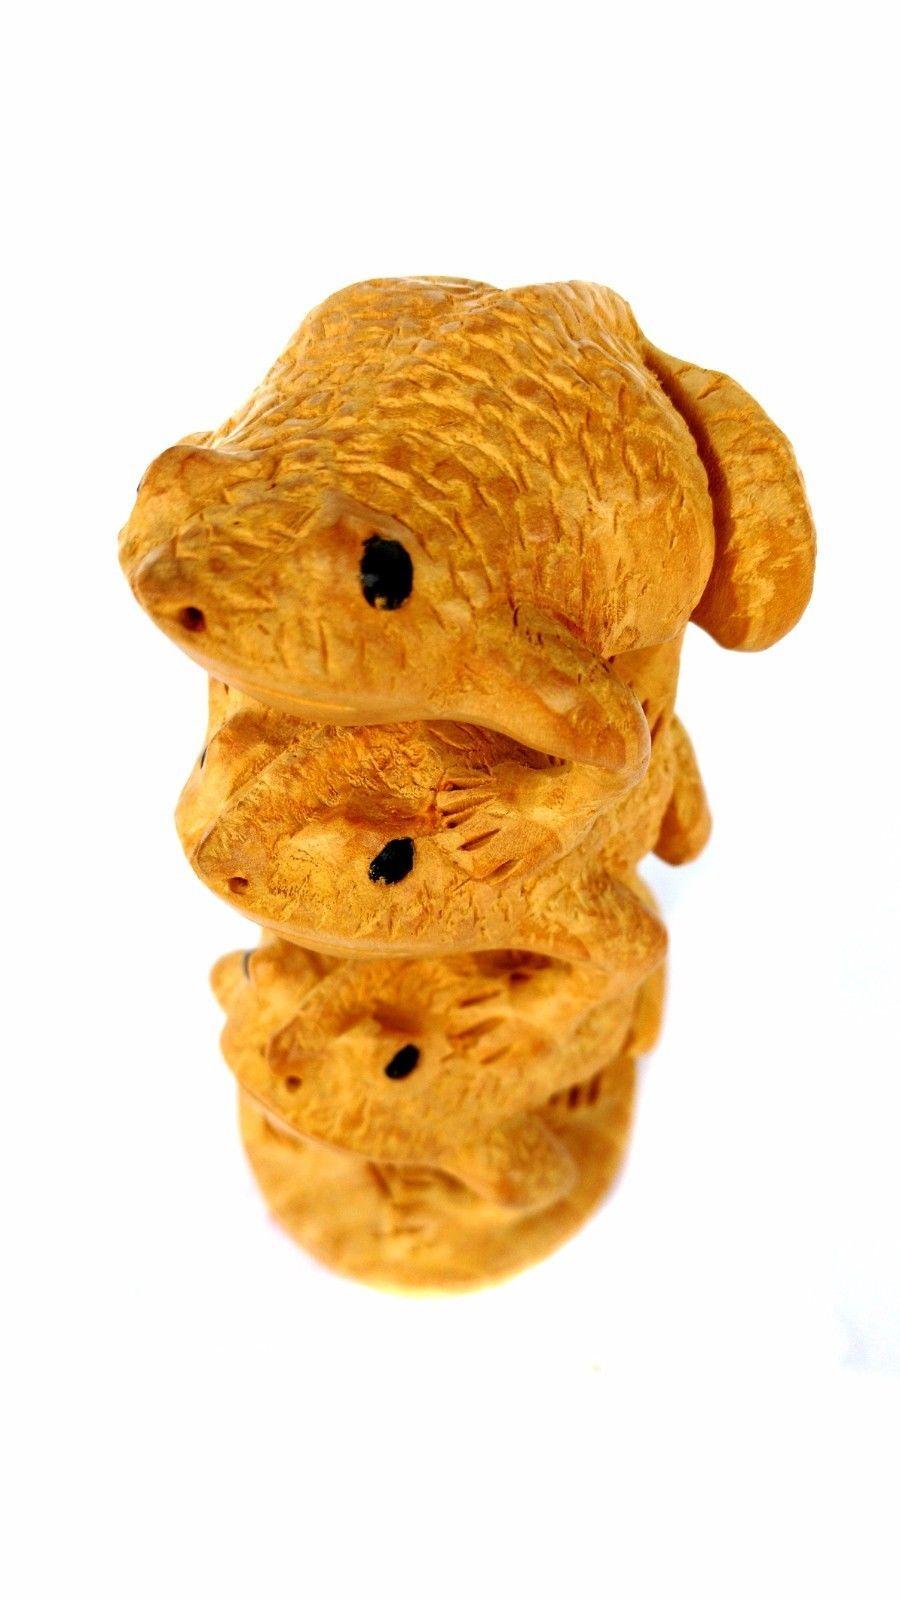 Carved Rare Wild Animal 3 Frog Sculpture Figurine Wooden Frog Statue Art Hand